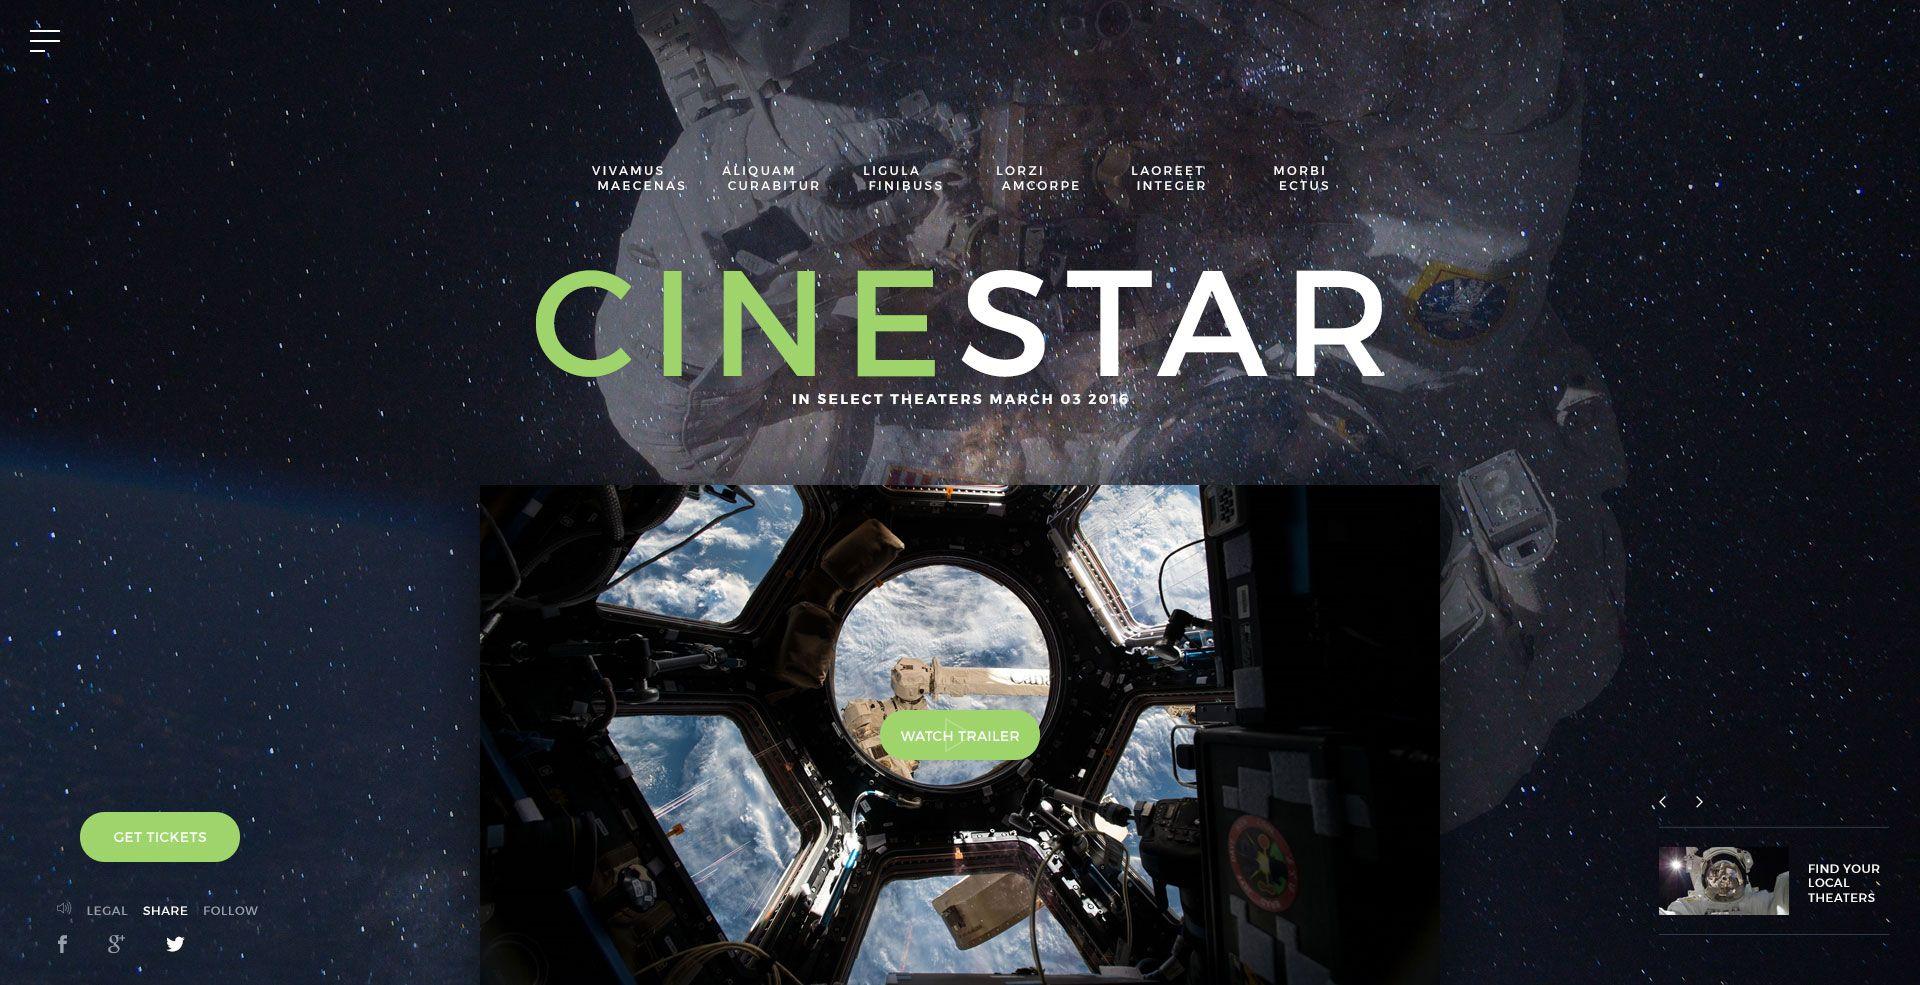 CINESTAR - Film Marketing PSD Template | Film & TV | Psd